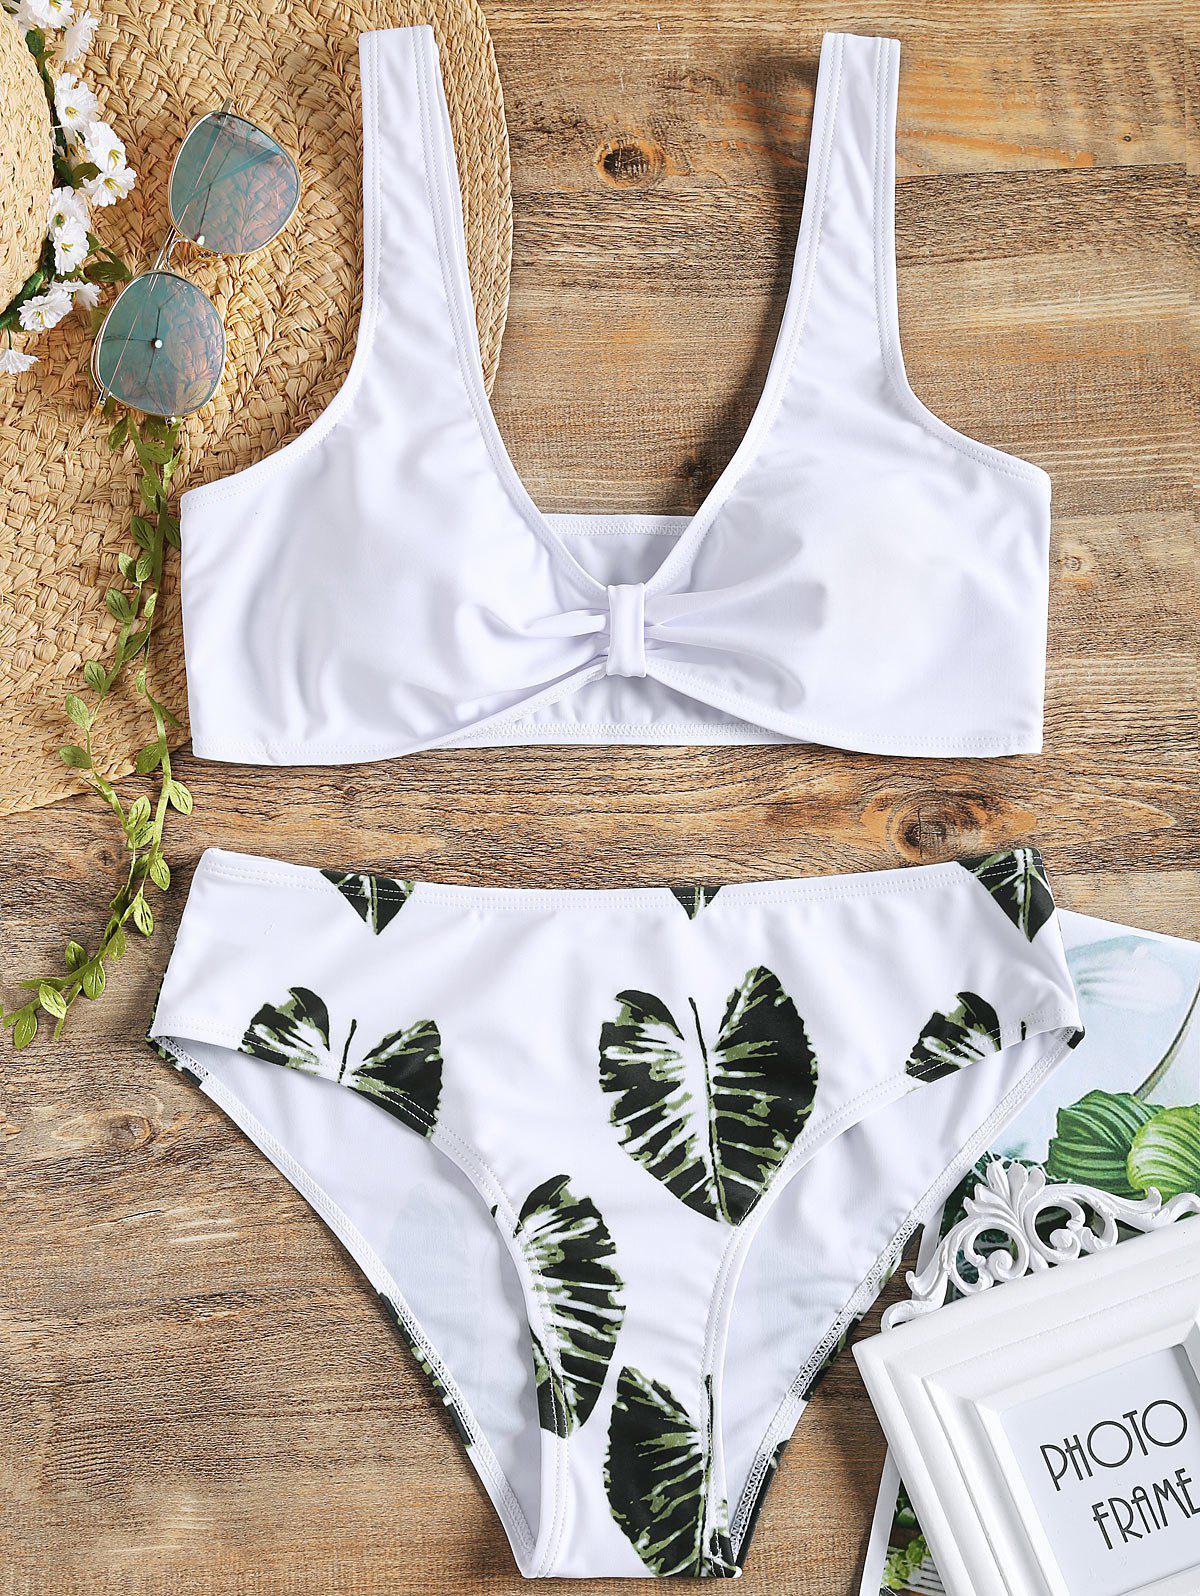 Palm Leaf Print Bowkno